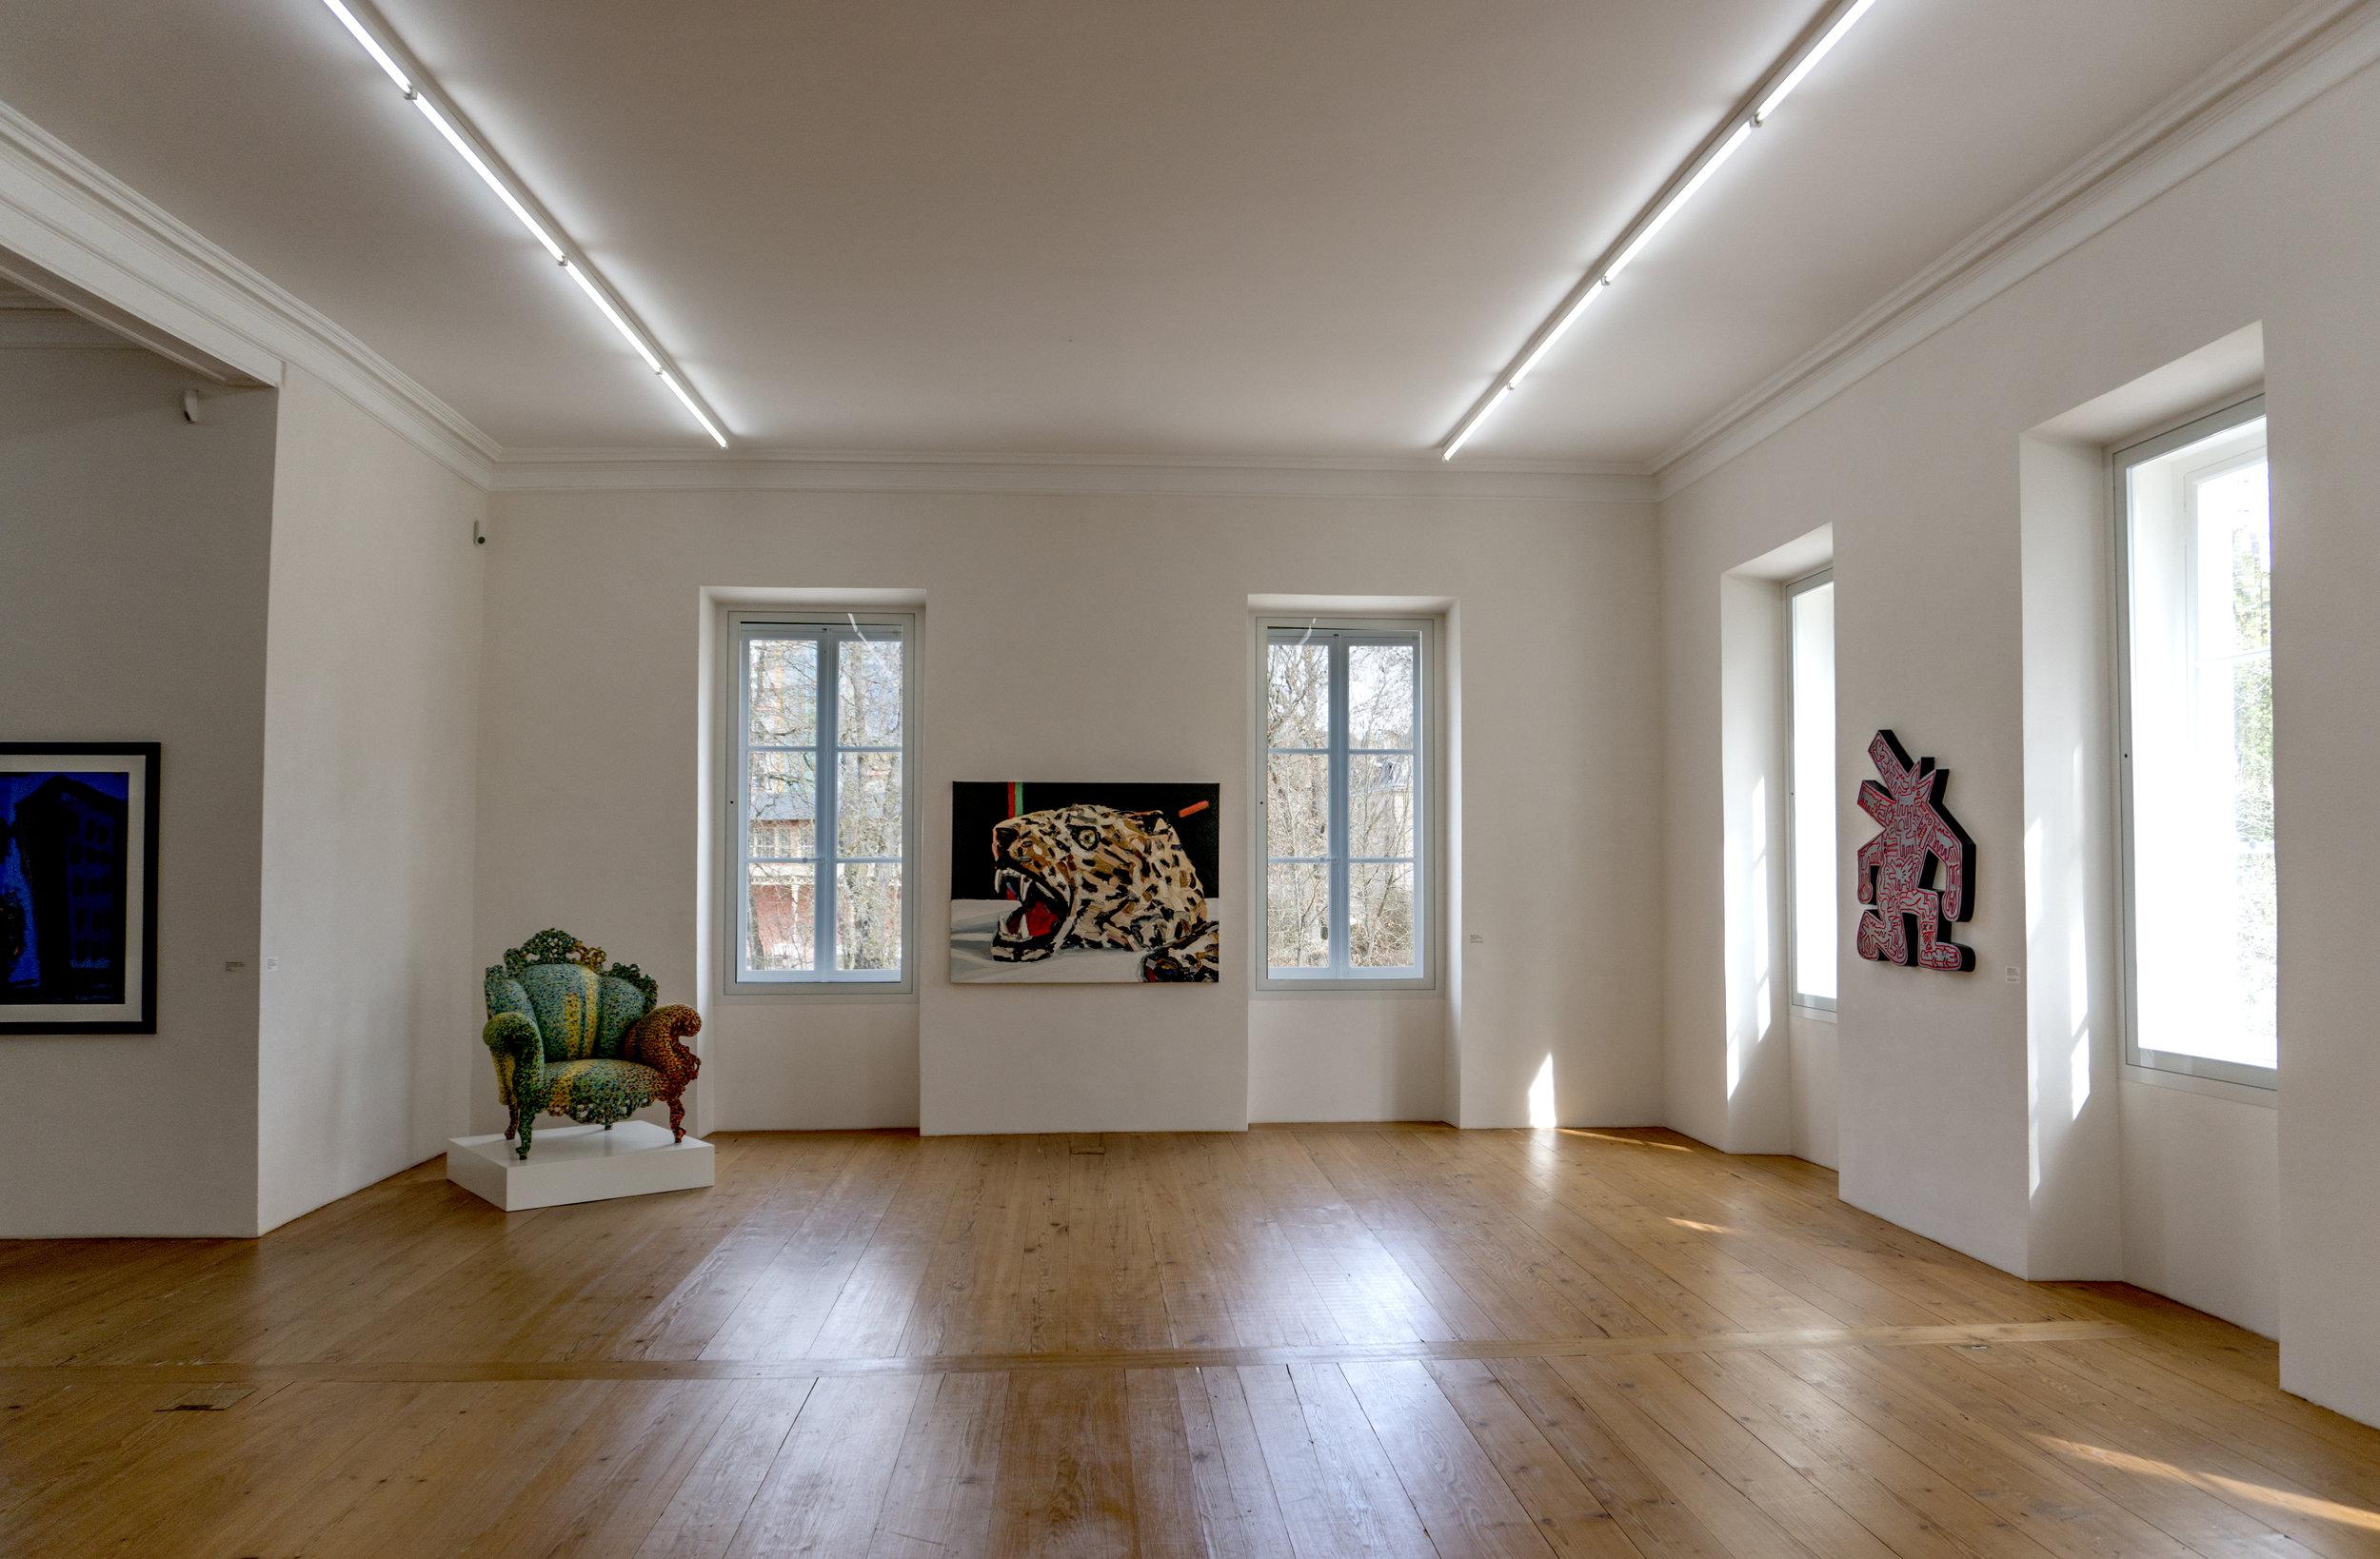 "(De gauche à droite)   Alessandro Mendini : ""Poltrona di Proust"" (1996) -  Ralph Fleck :  ""Still Life with Trophy II"" (1987) -   Keith Haring  : sans titre (1983)"